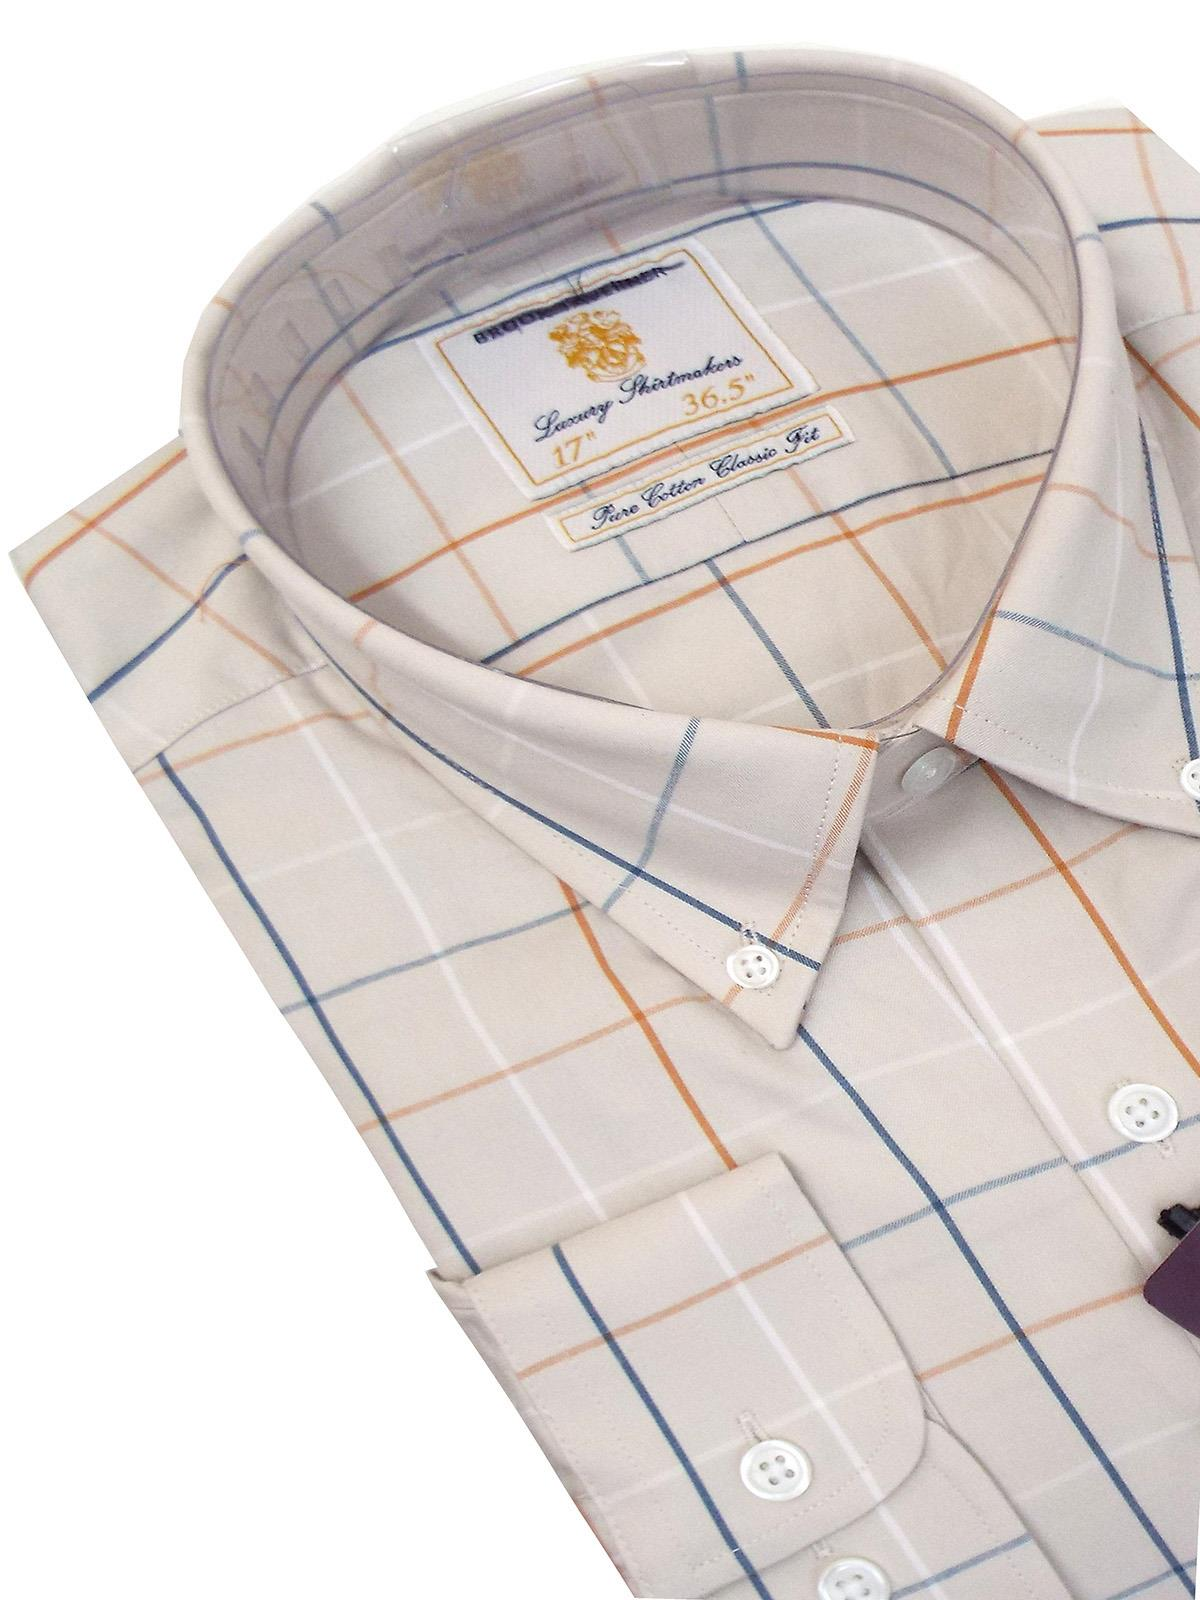 BROOK TAVERNER Mens Tattershall Check Cotton Shirt Long Sleeve RRP £60